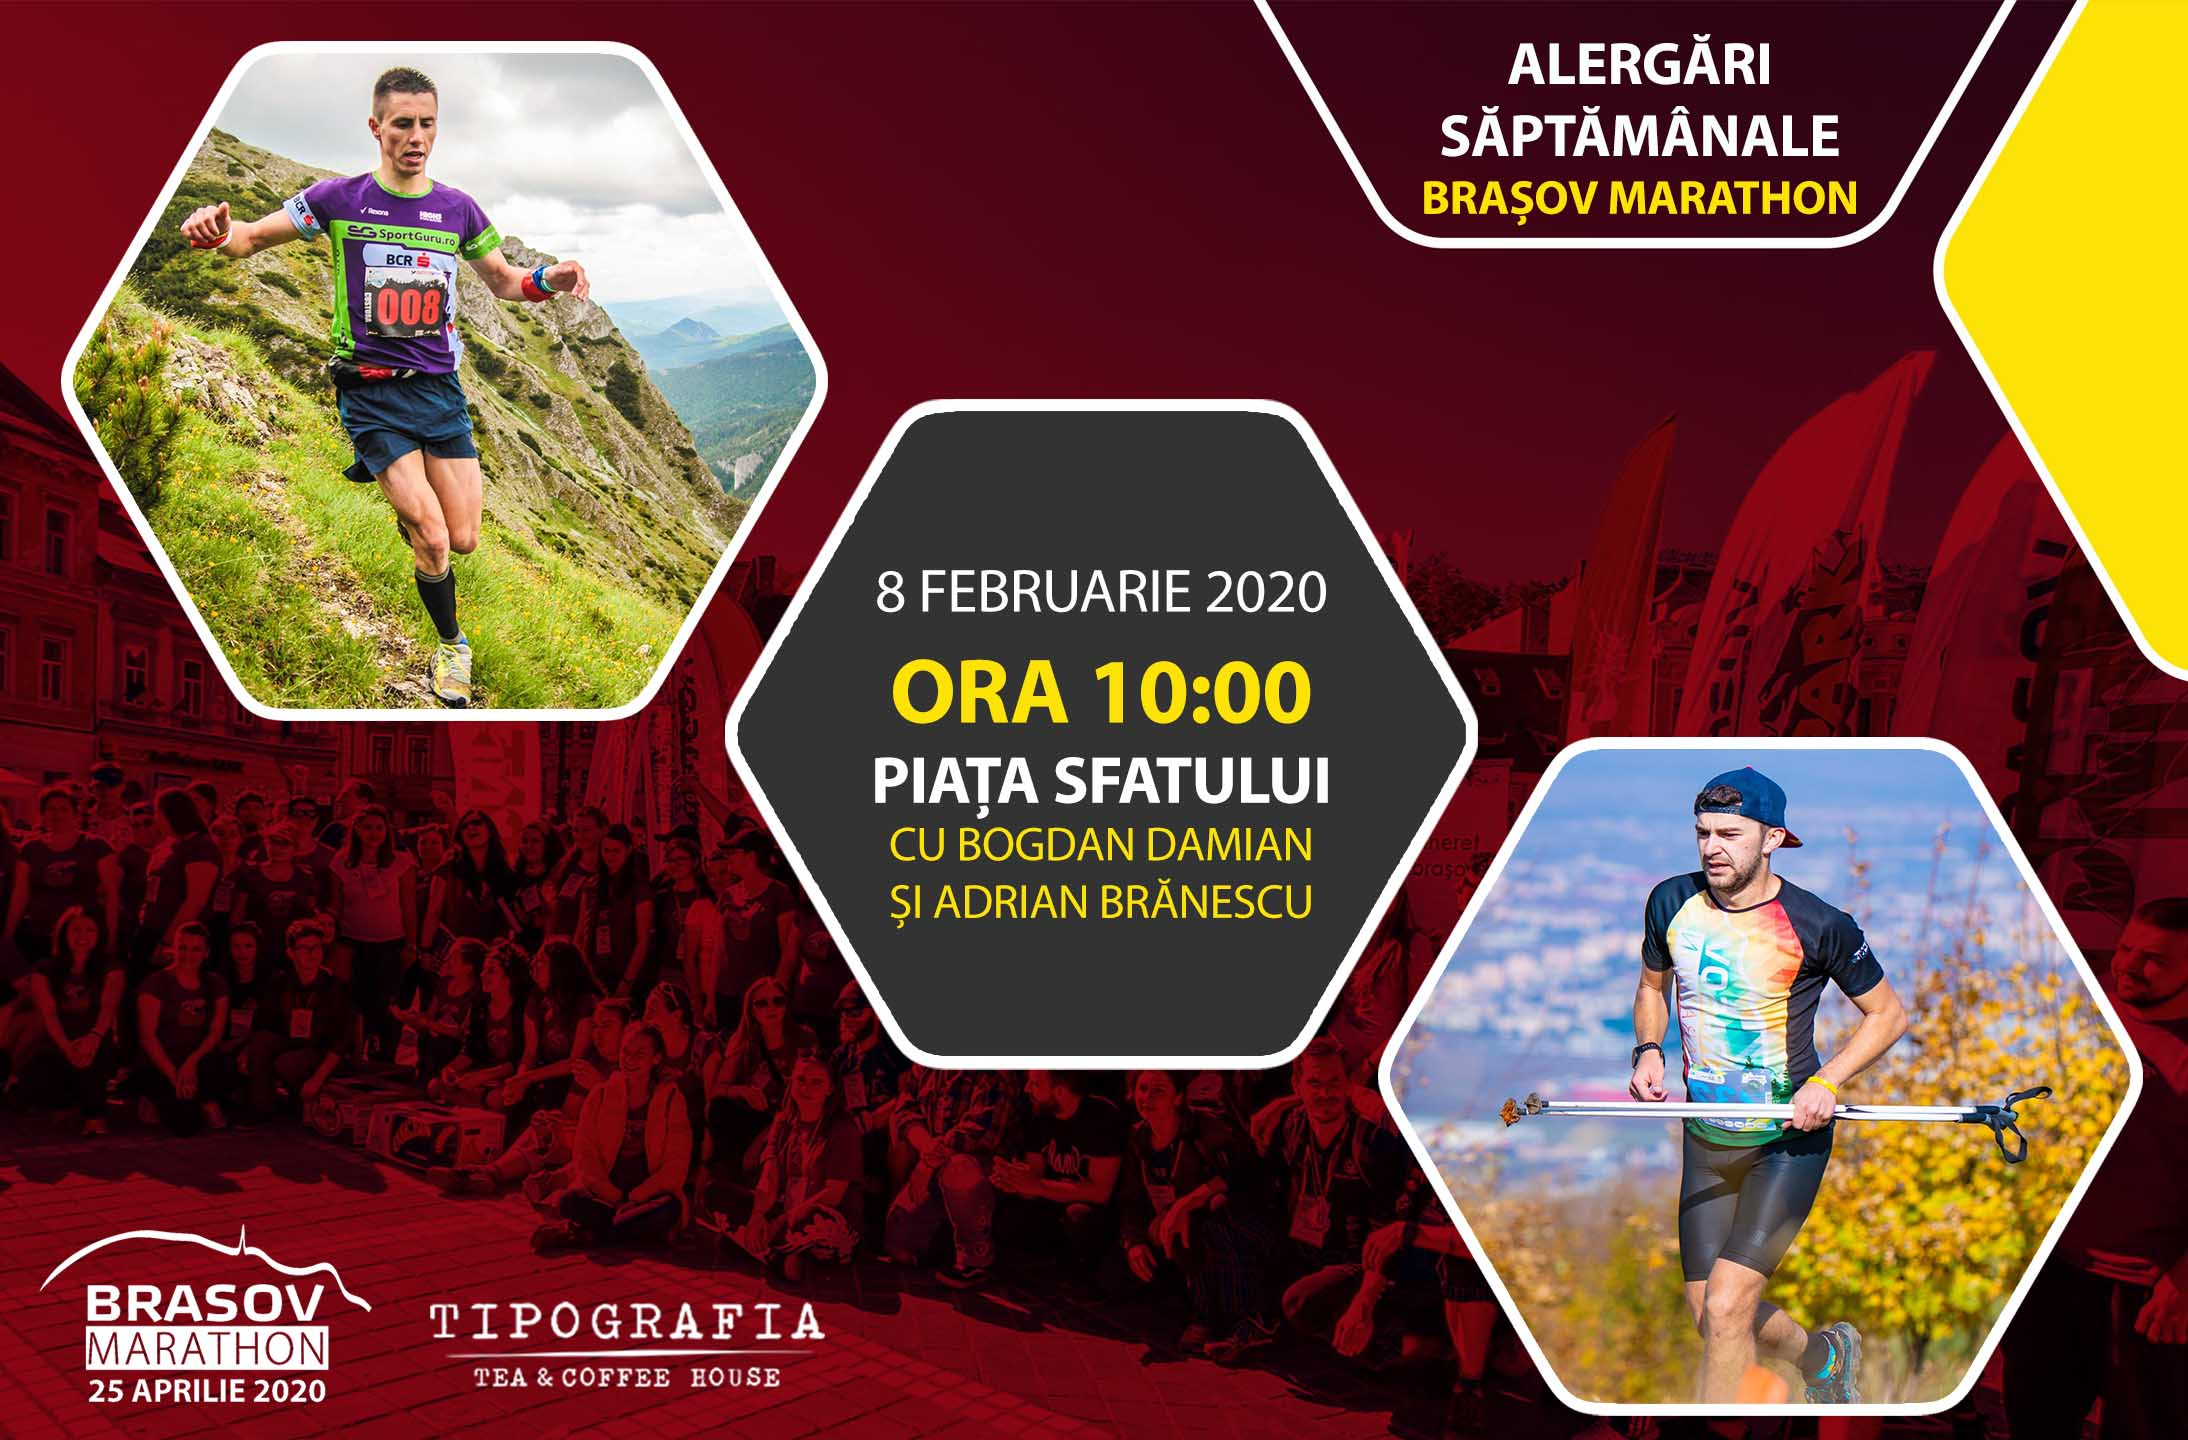 Brasov_marathon ALERGARE 8 FEBRUARIE 2020 redimensionata